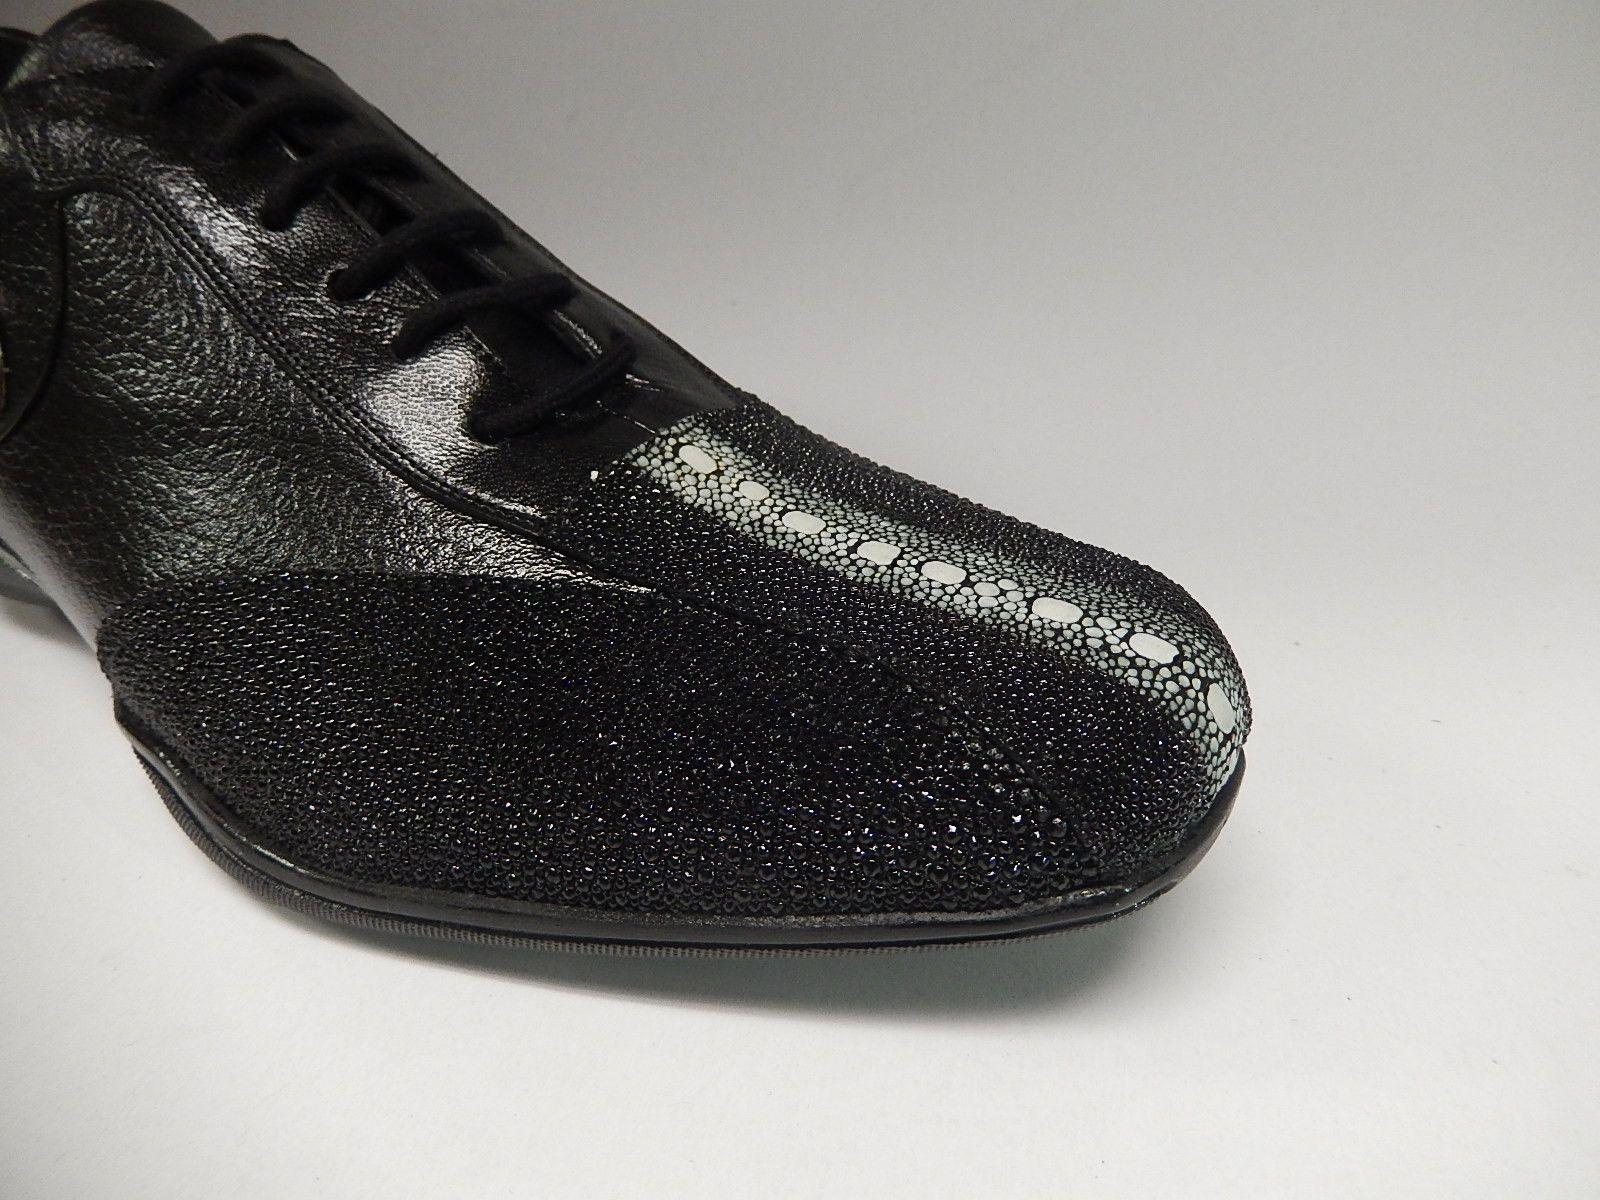 Wild West Boots Stingray Pebble Grain Sneakers